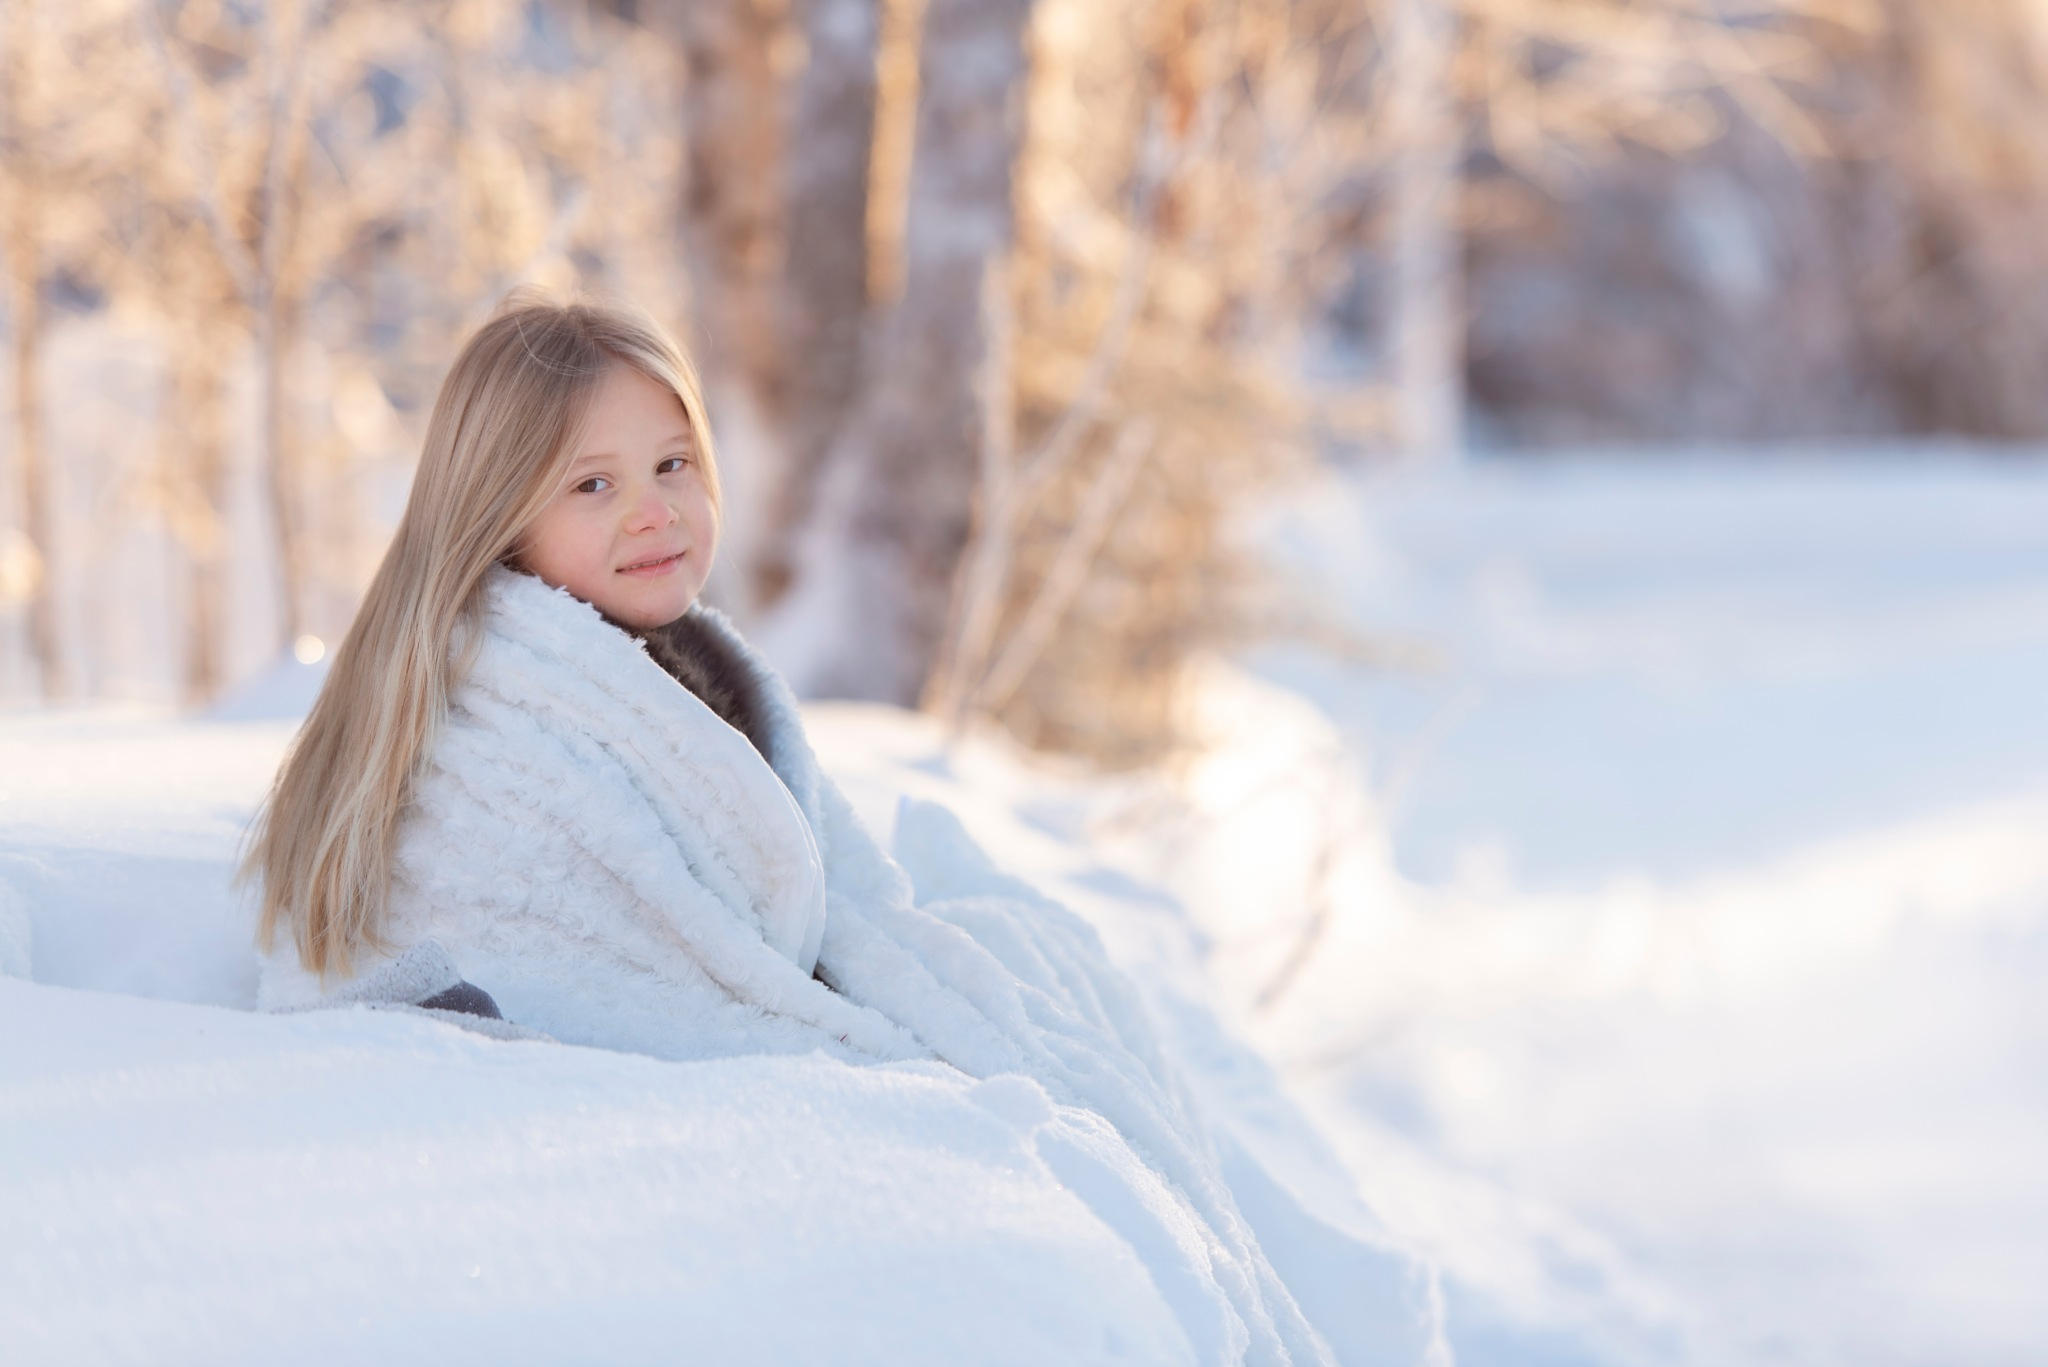 Sunshine during winter by anjutka1982